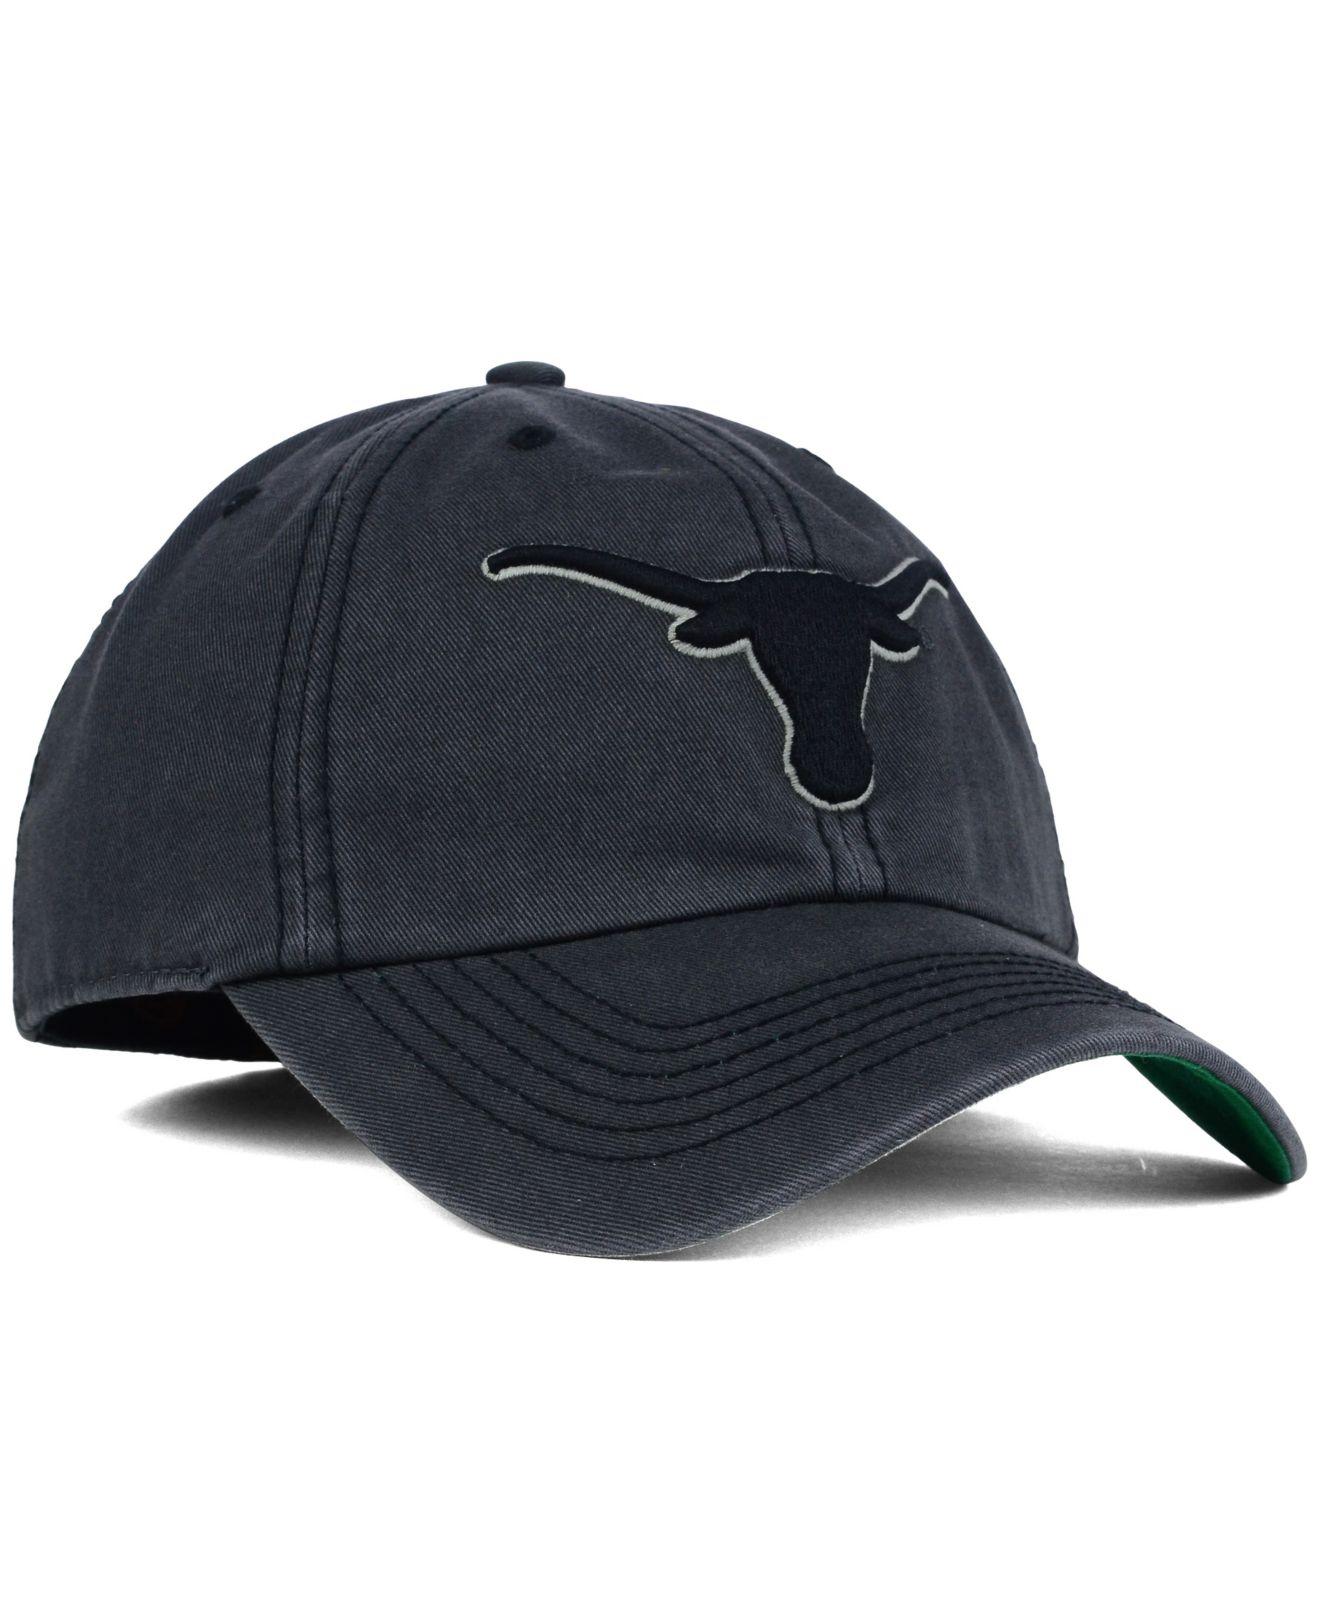 Lyst - 47 Brand Texas Longhorns Sachem Cap in Gray for Men b86bc10a0c35